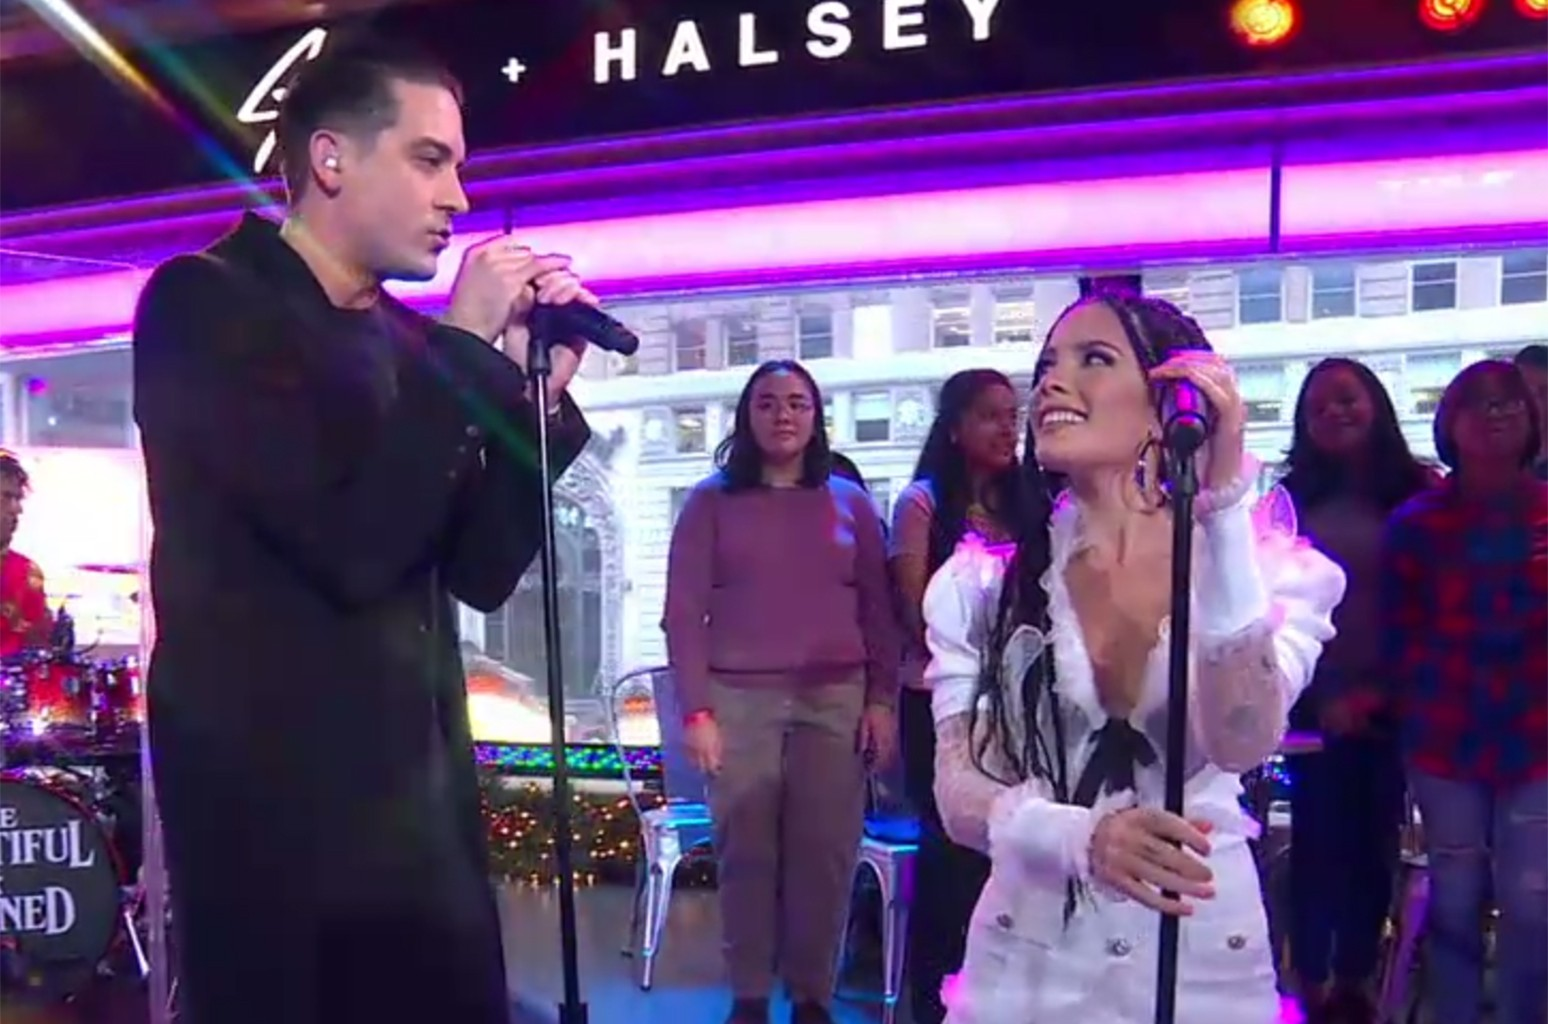 G-Eazy and Halsey